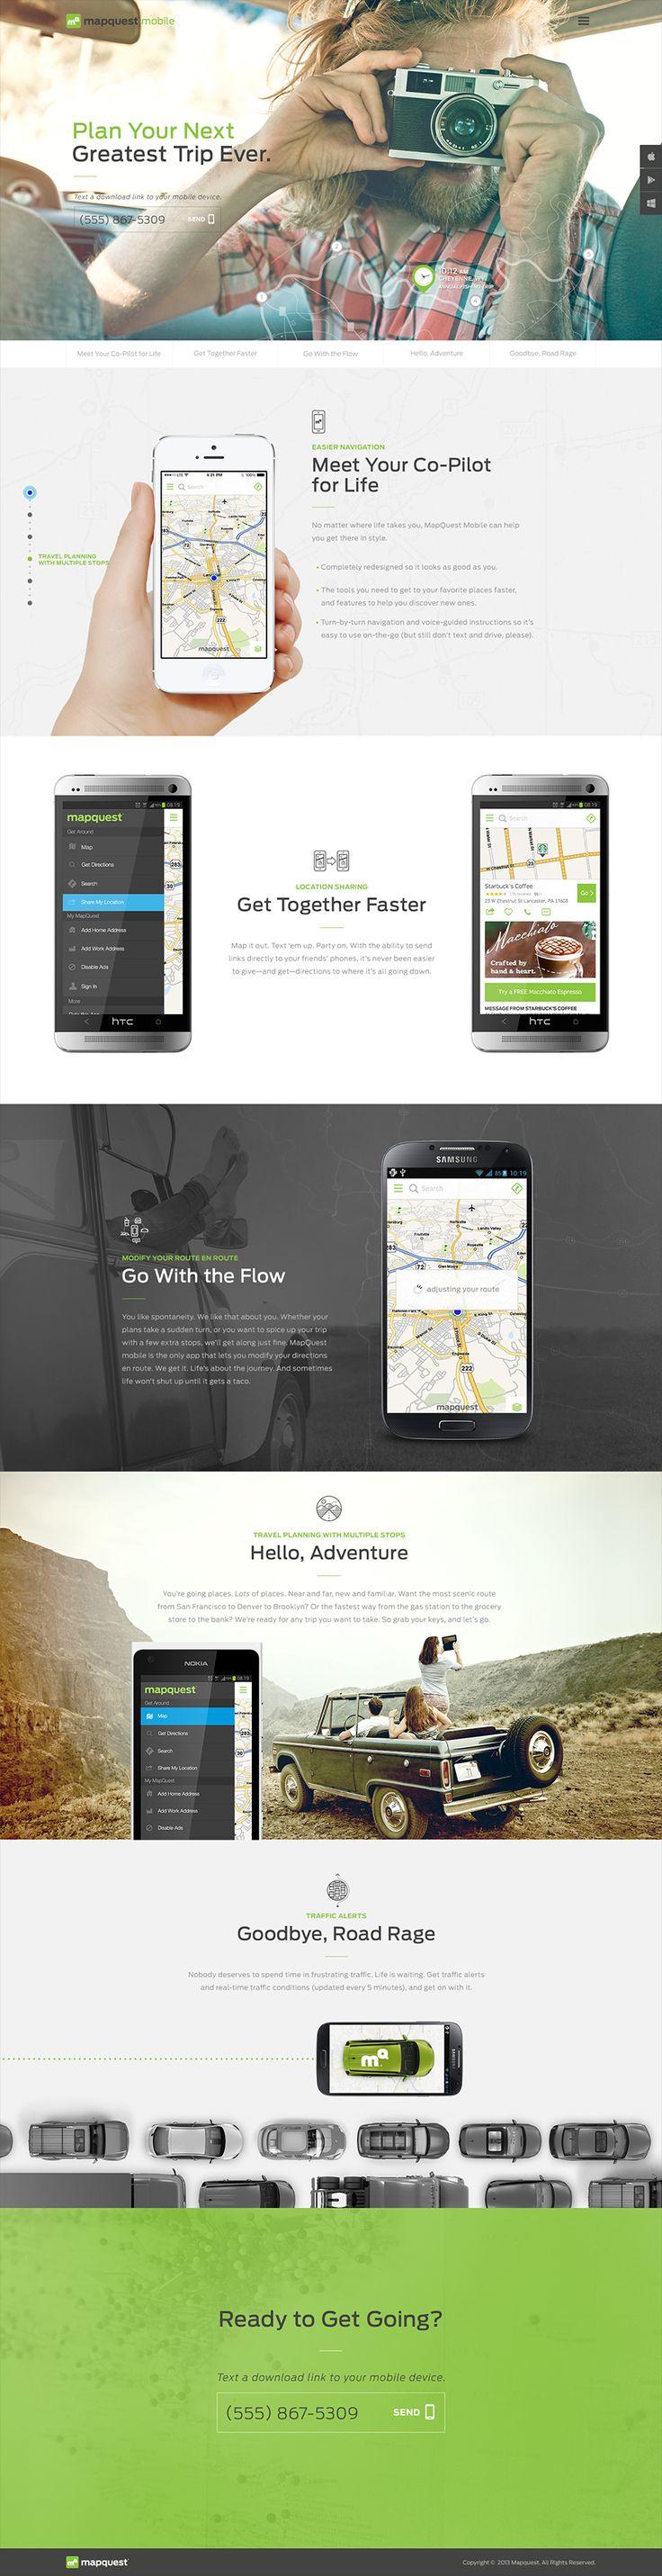 http://mobile.mapquest.com/#co-pilot